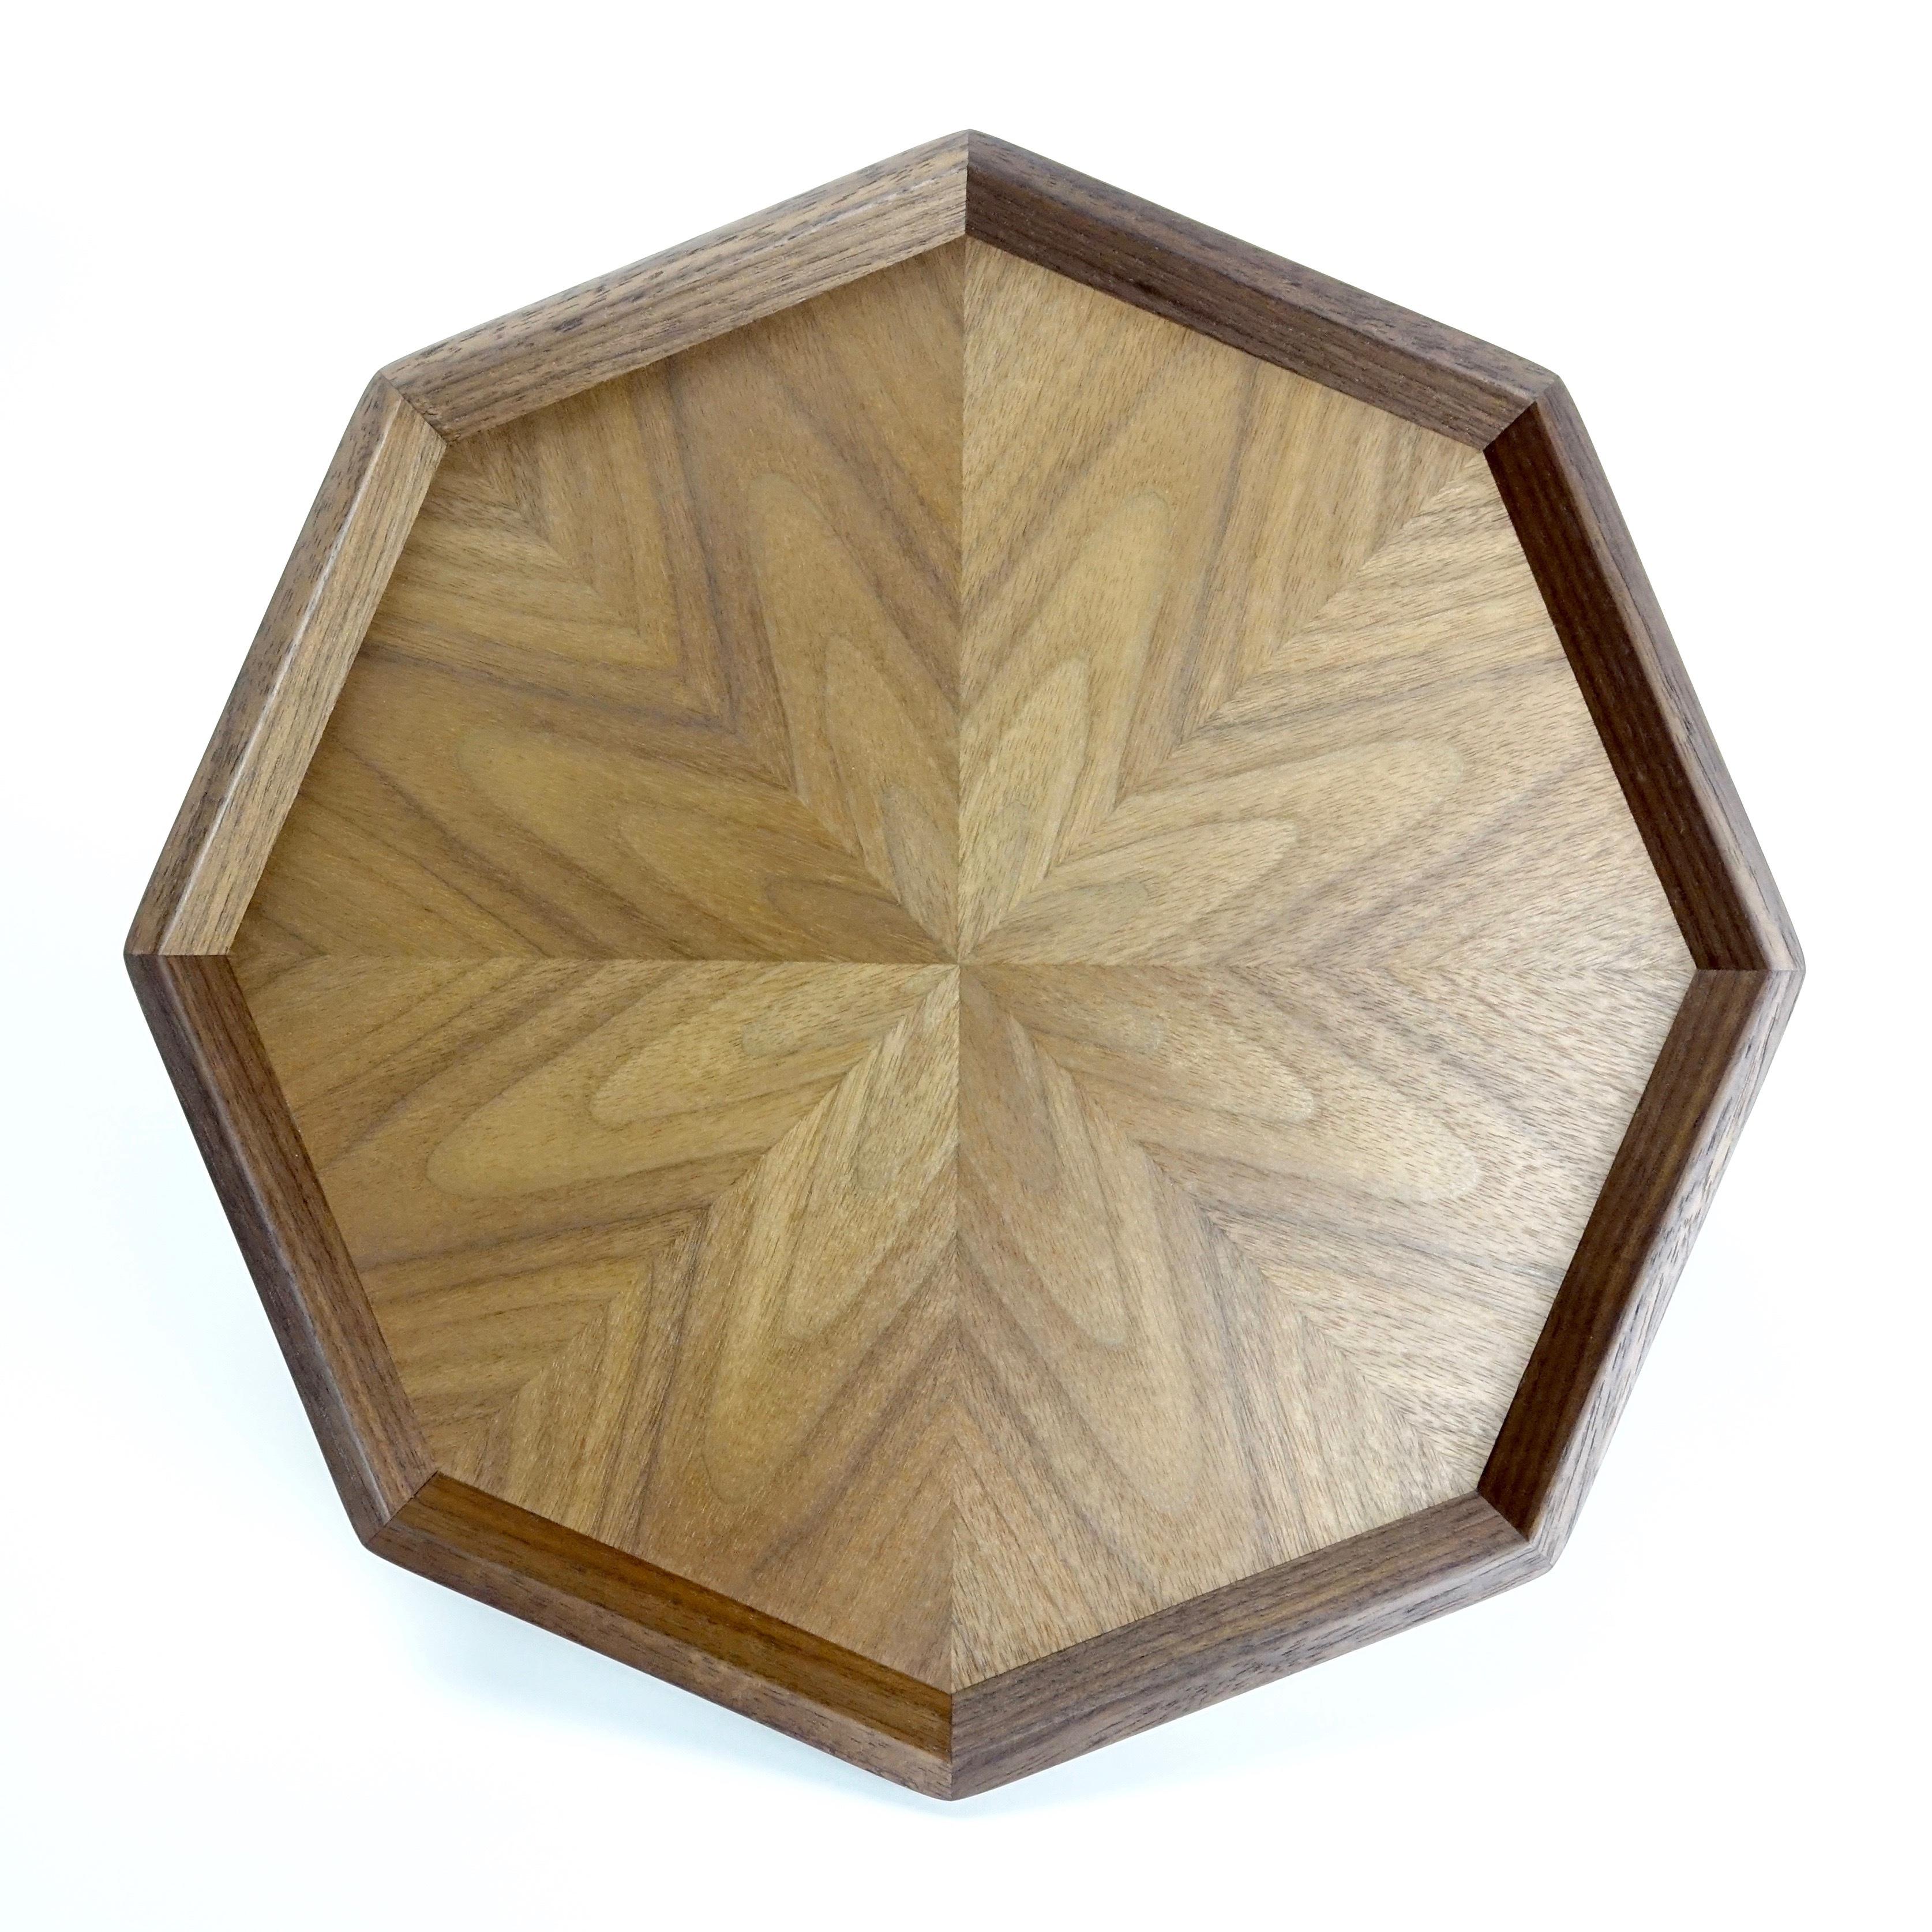 Black Walnut 八角形のトレー OBWT-0159